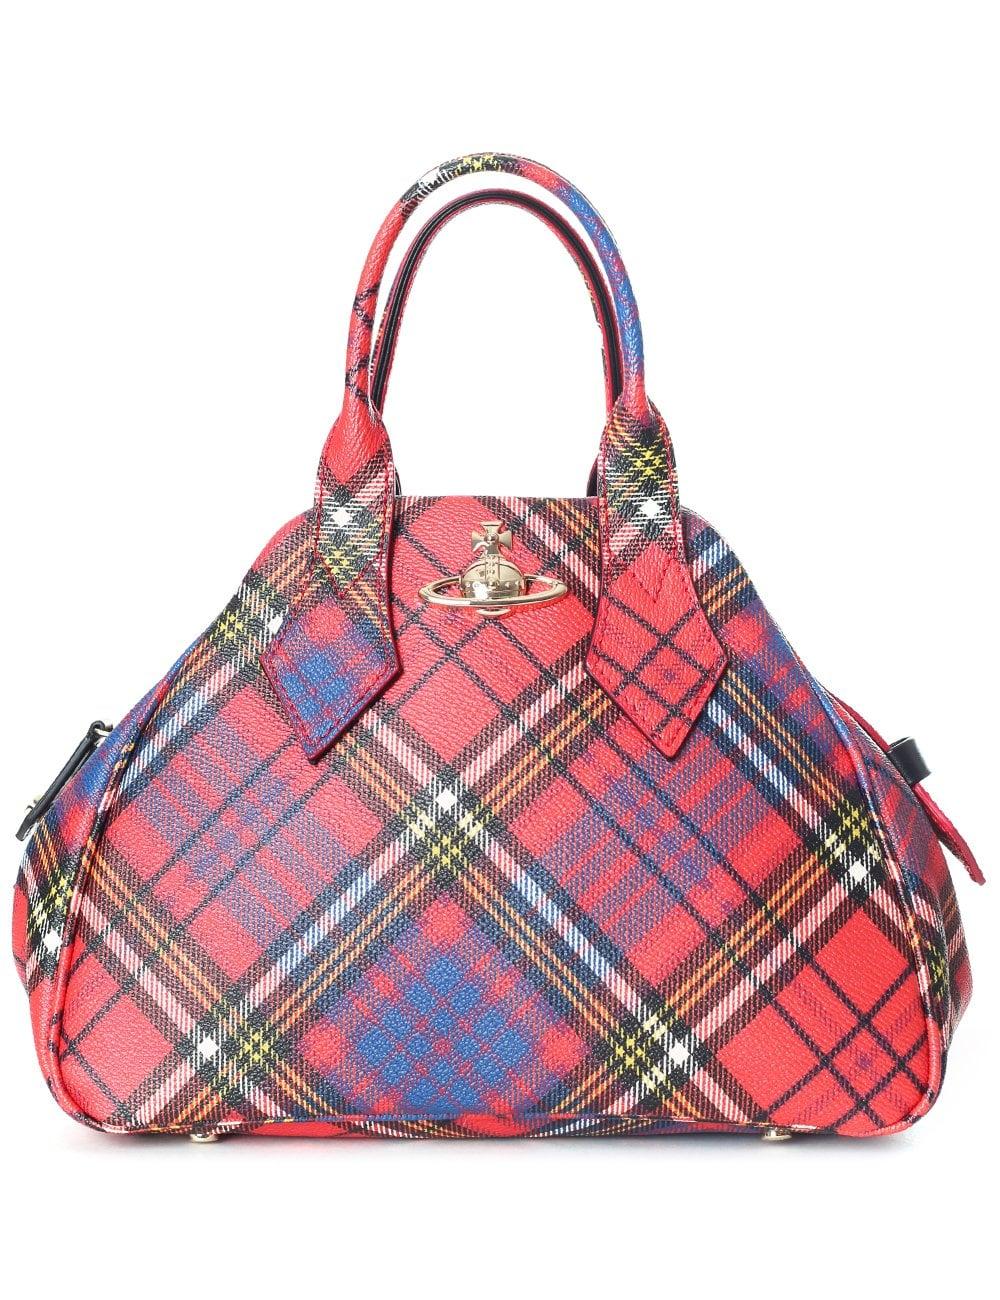 3c9dcc14b1371 Vivienne Westwood Women's Medium Yasmine Bag Mc Andreas